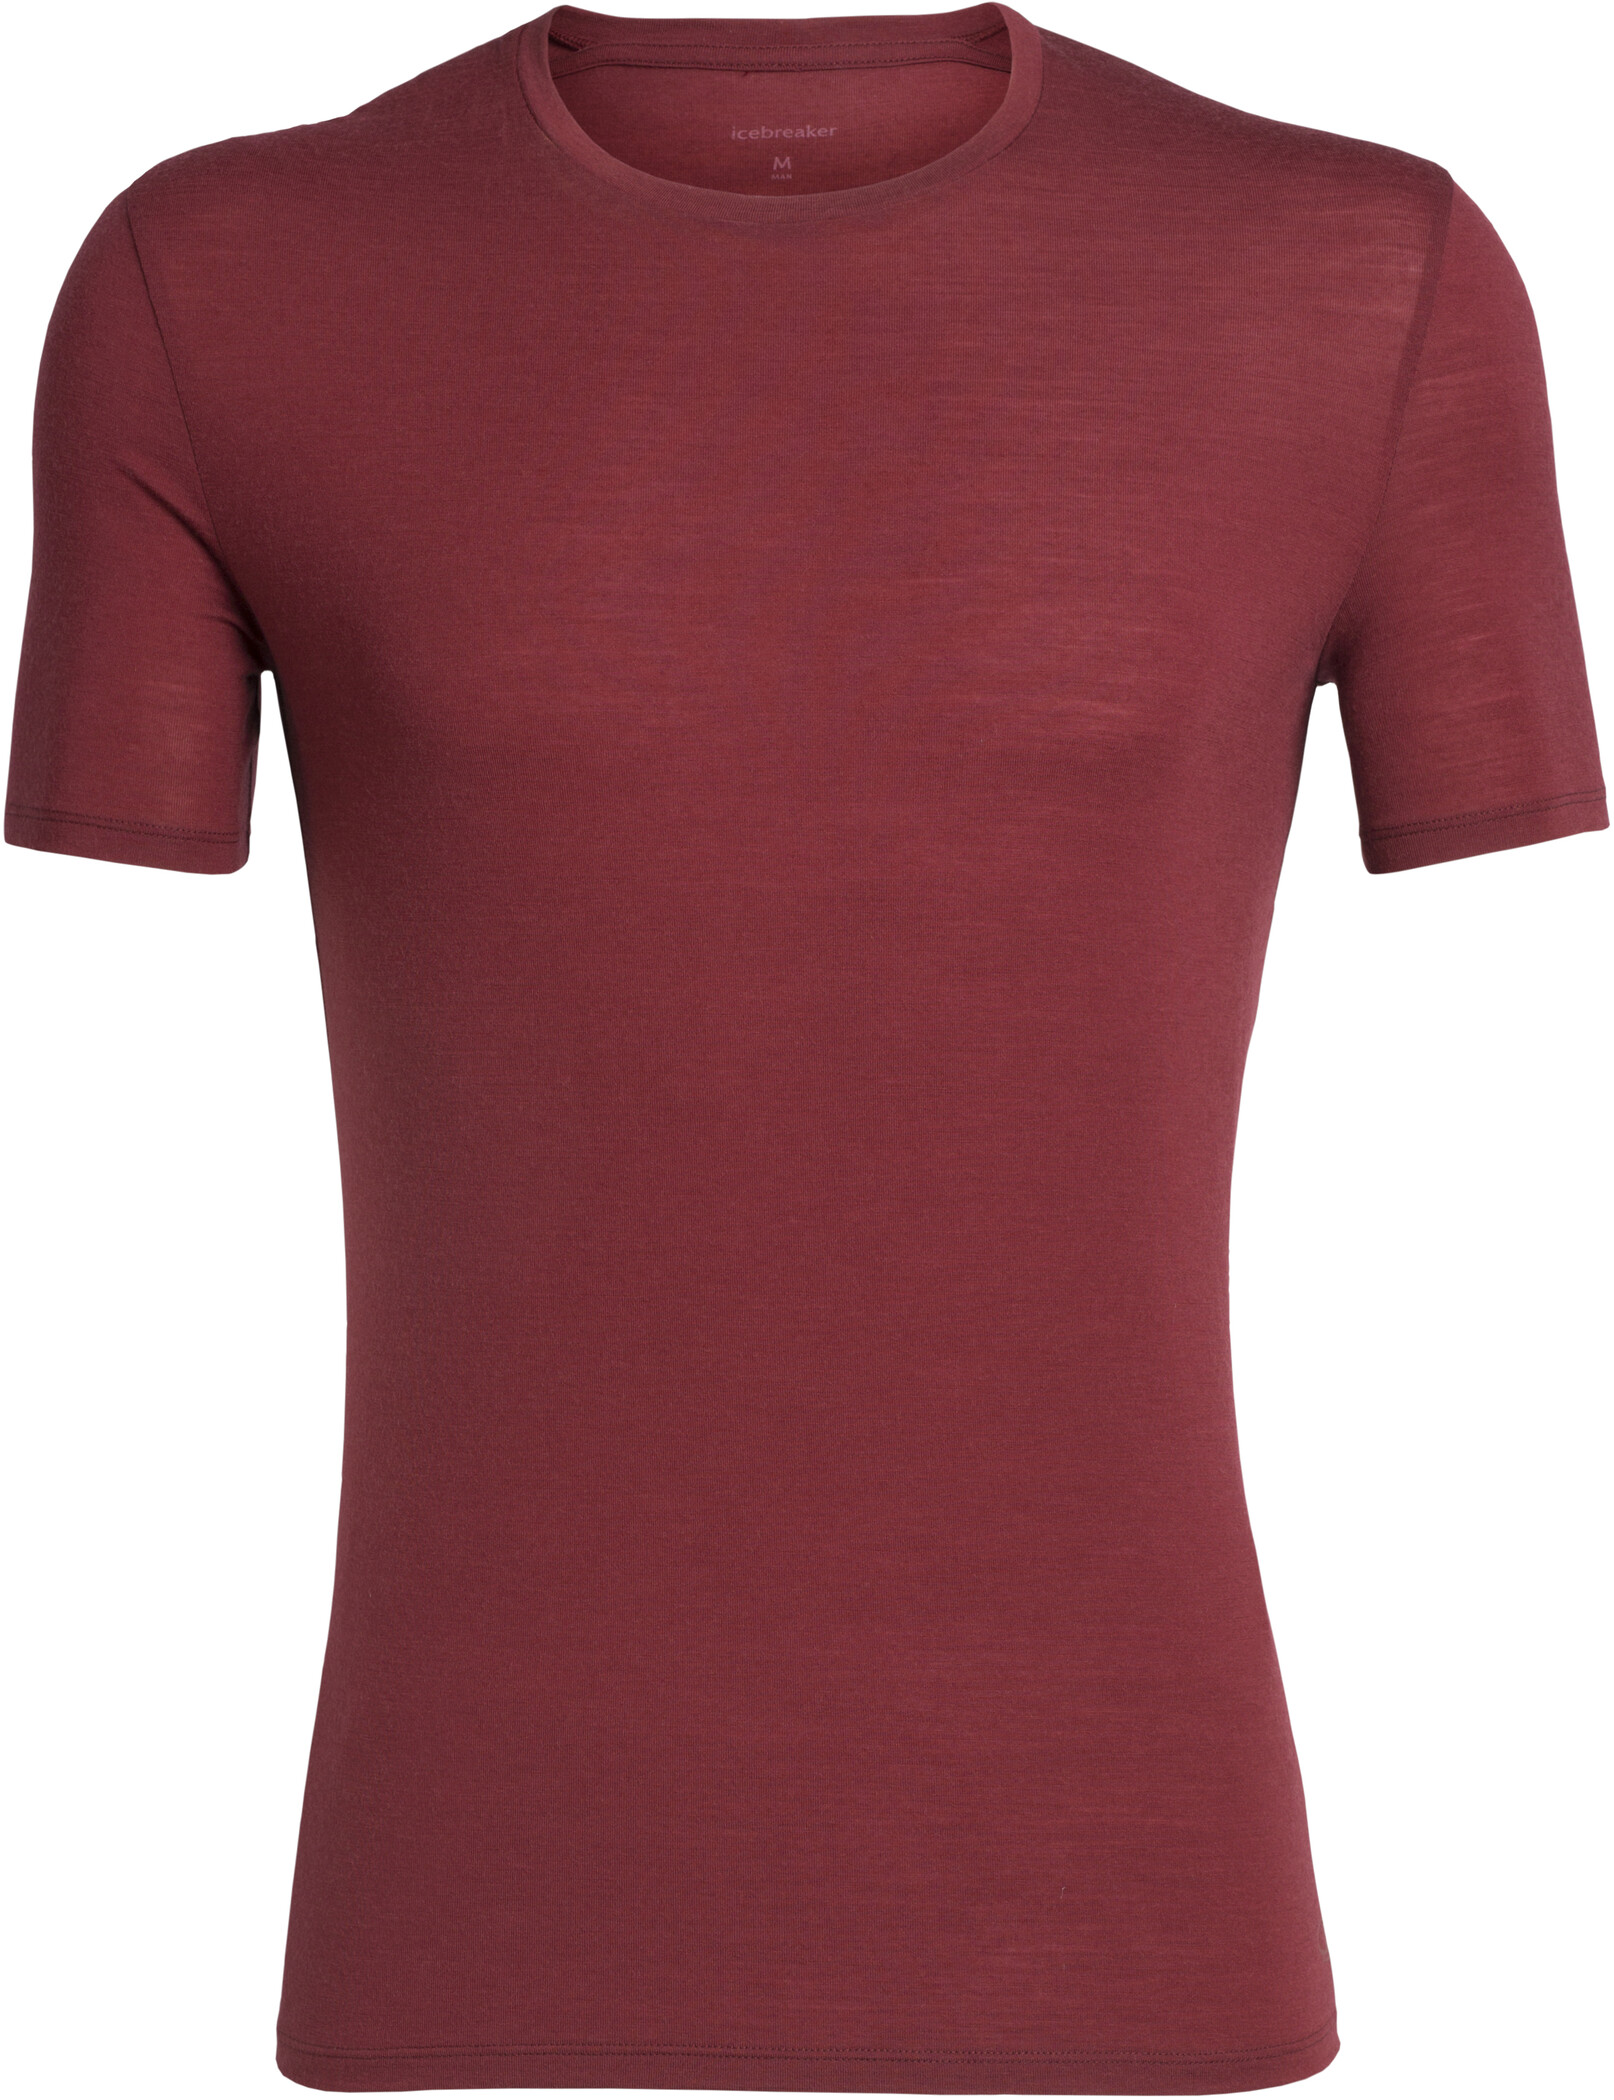 Icebreaker Anatomica T-shirt Herrer, cabernet (2019) | Base layers